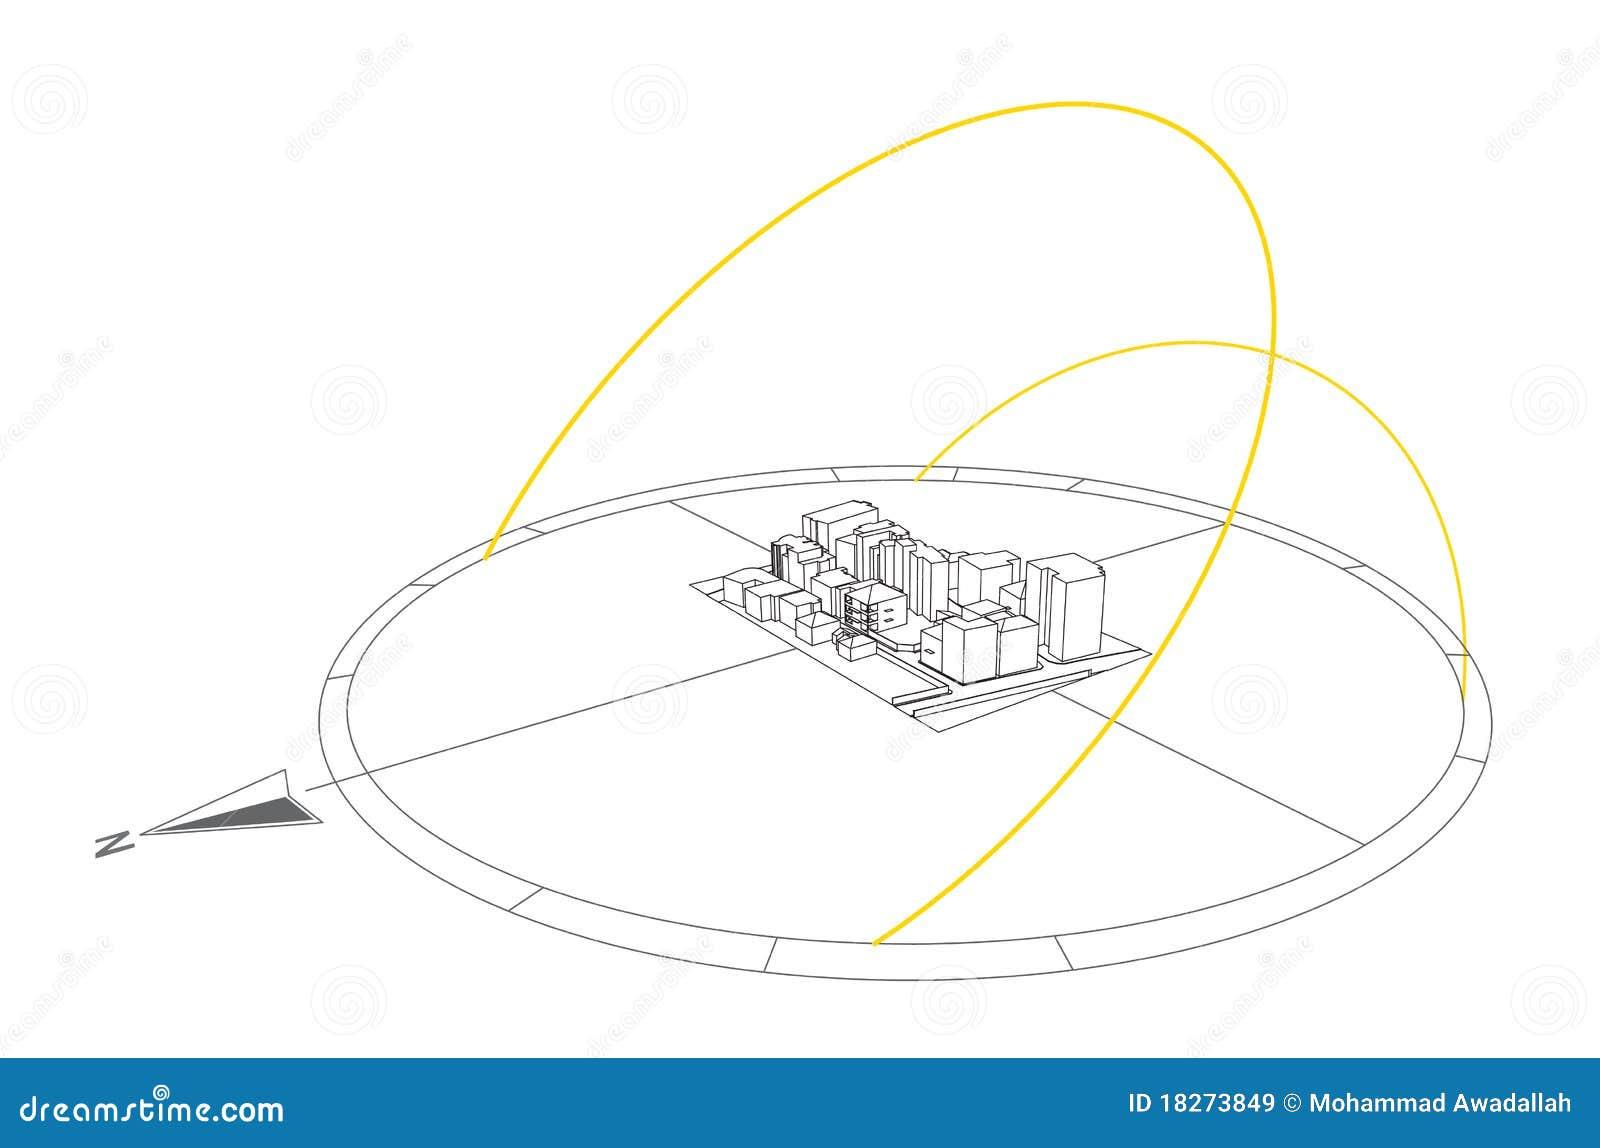 single line diagram of solar turbine